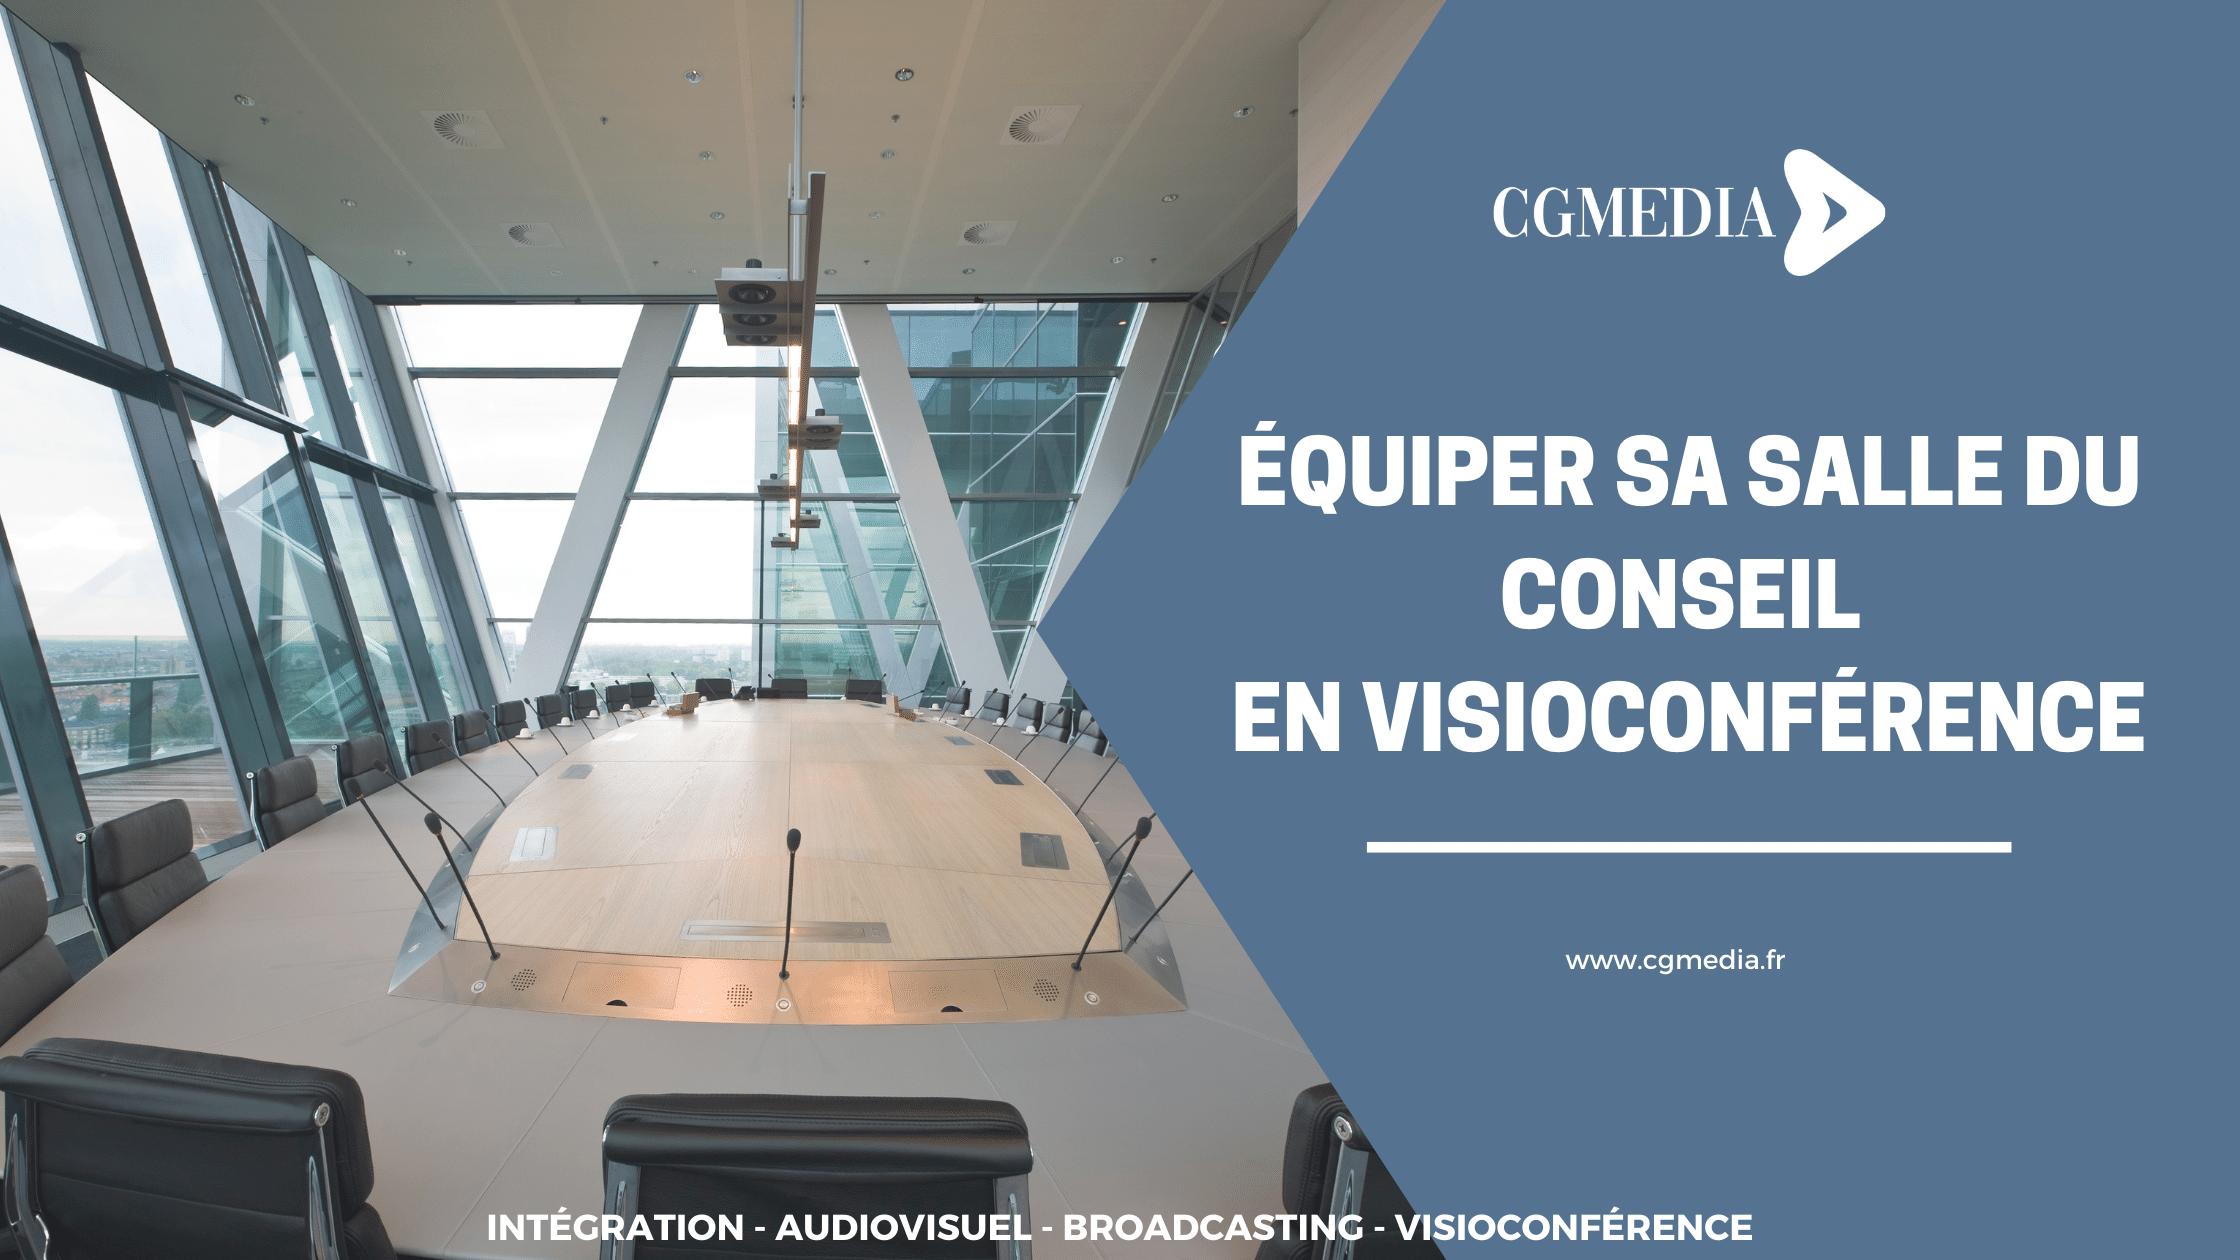 Equiper sa salle du conseil en visioconférence - CGMEDIA